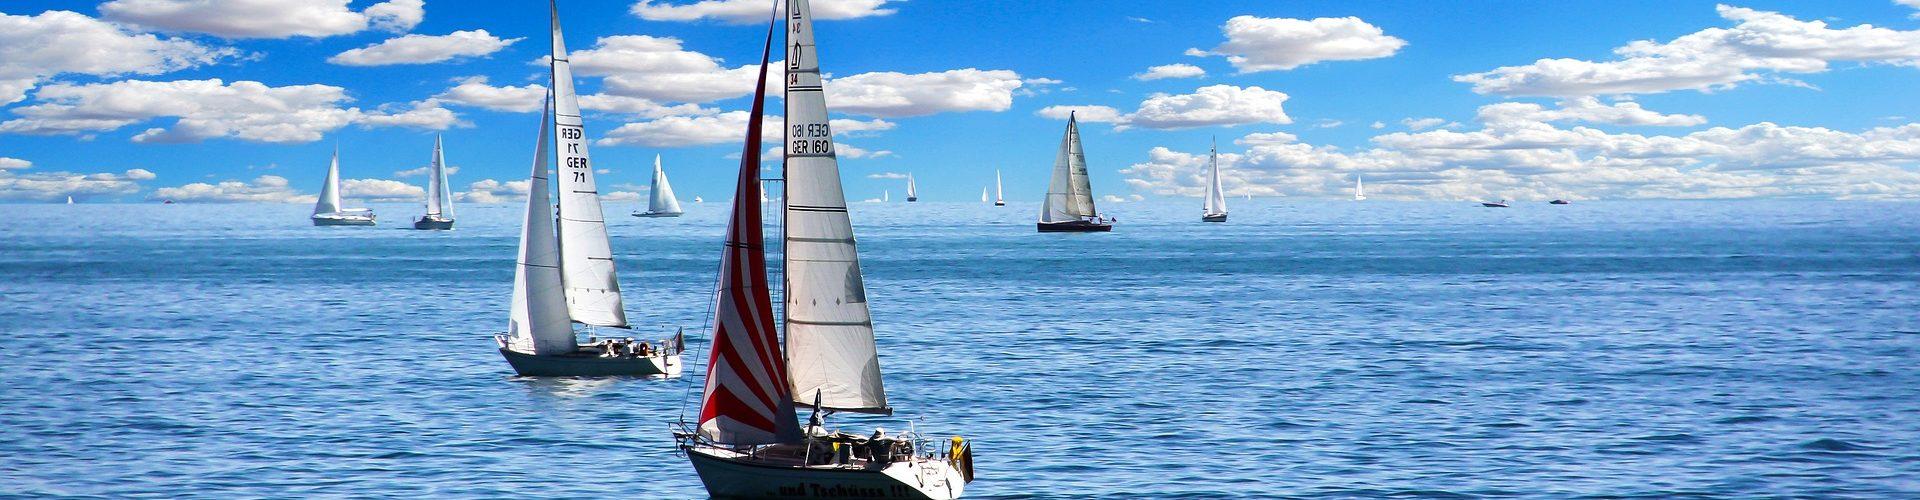 segeln lernen in Nörten Hardenberg segelschein machen in Nörten Hardenberg 1920x500 - Segeln lernen in Nörten-Hardenberg